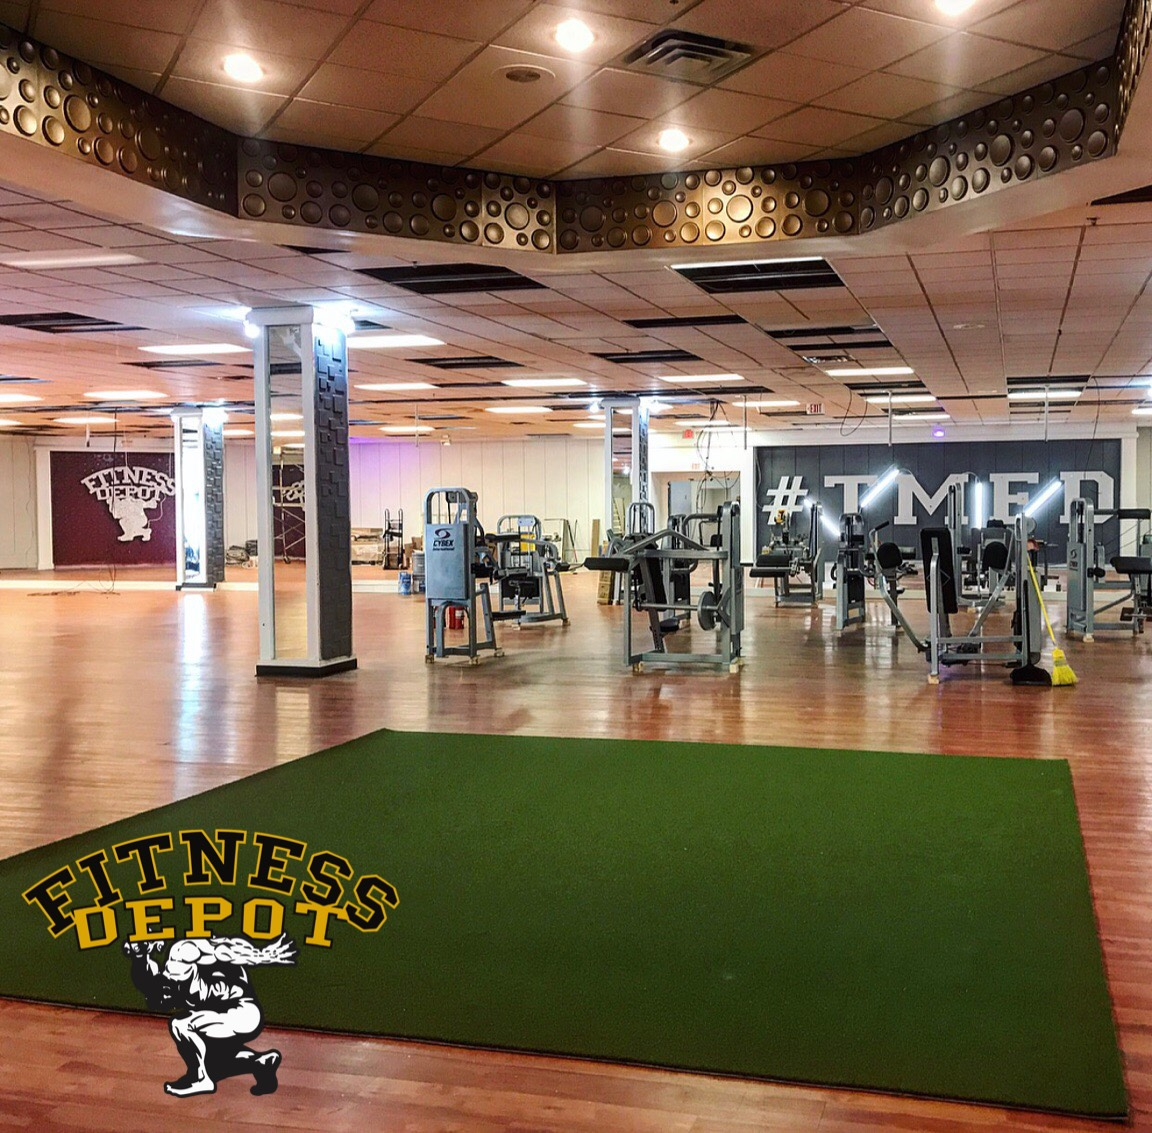 Fitness Depot Gyms Inc 1396 Bonita Lakes Circle Meridian Ms 39301 Yp Com